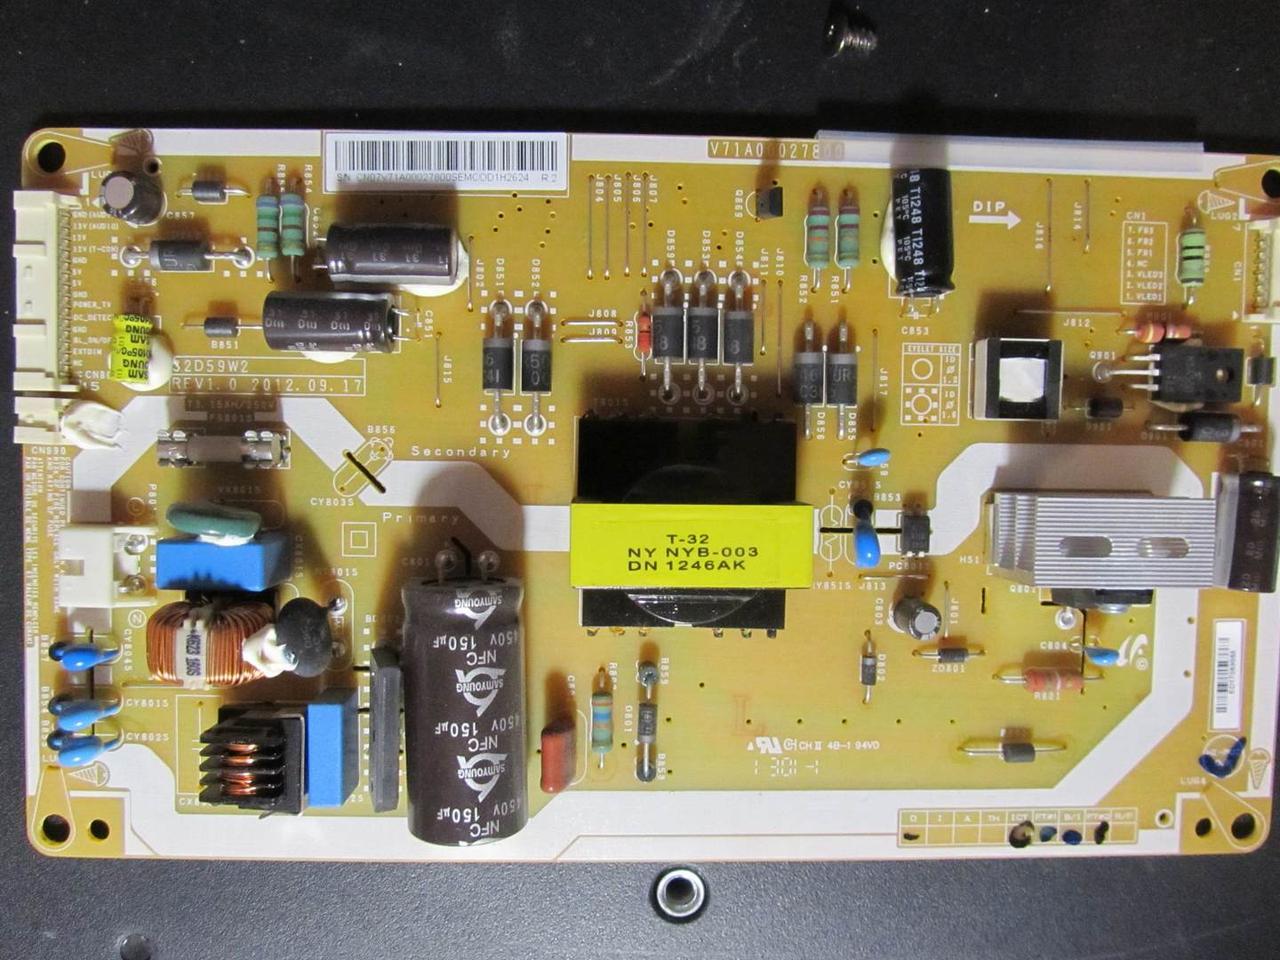 Запчастини до телевізора Toshiba 32PB200V1 (V28A001439A0 , V71A00027800)